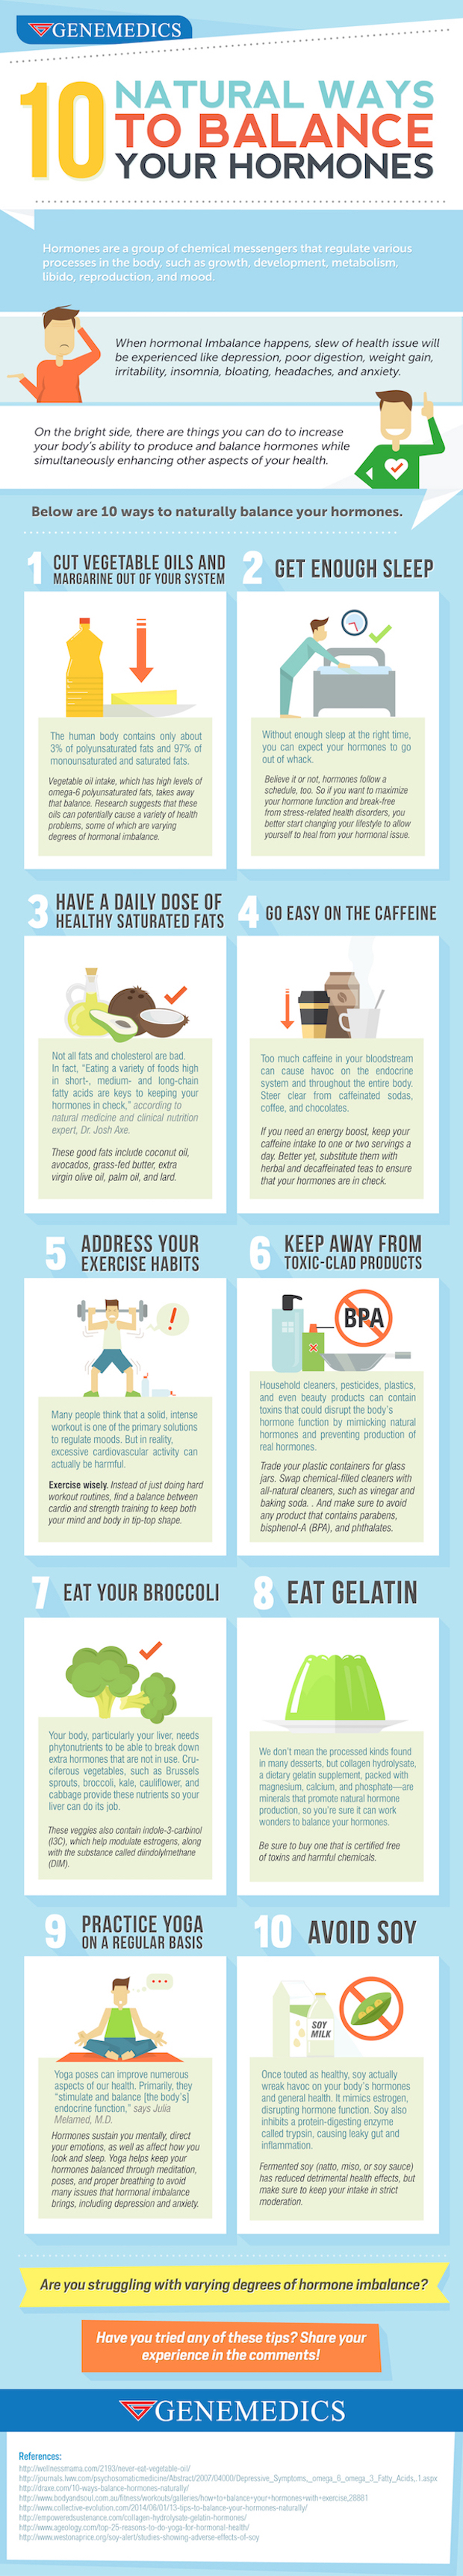 Natural Ways to Balance your Hormones